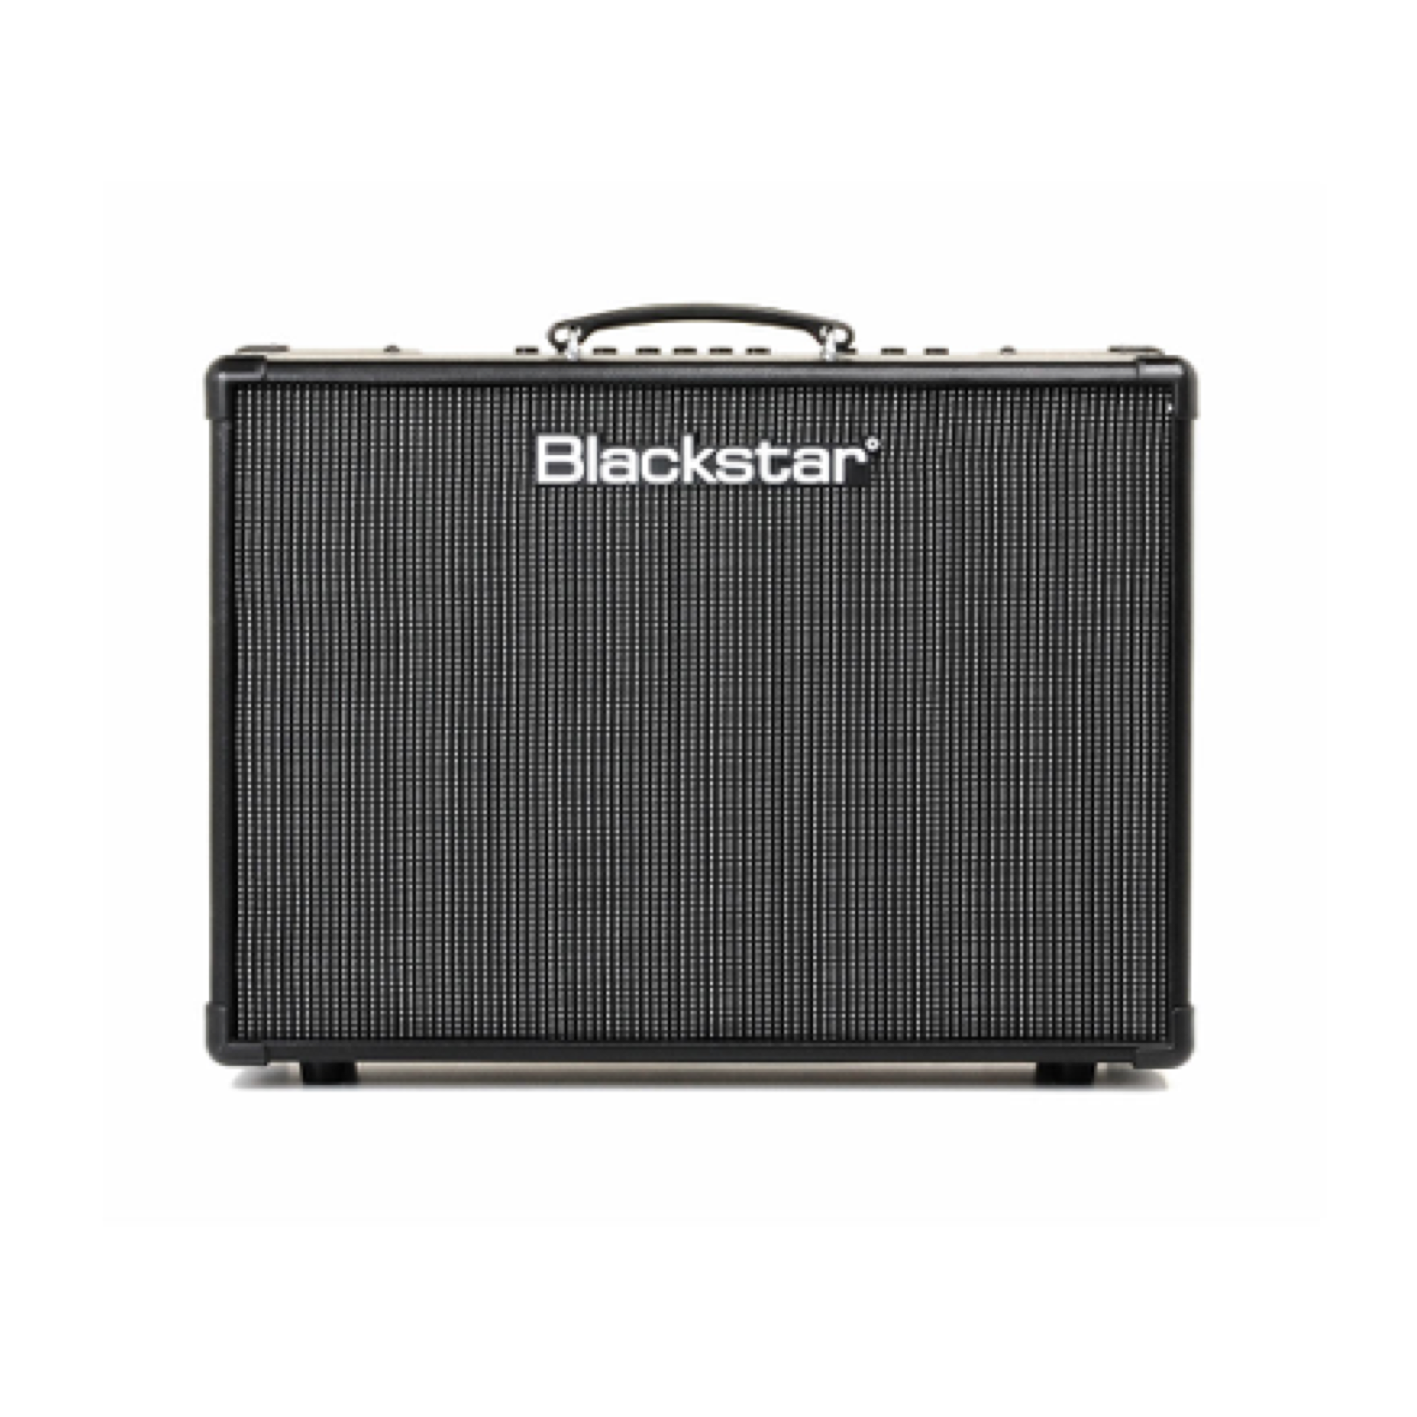 Blackstar ID:CORE Stereo 100w Guitar Amp